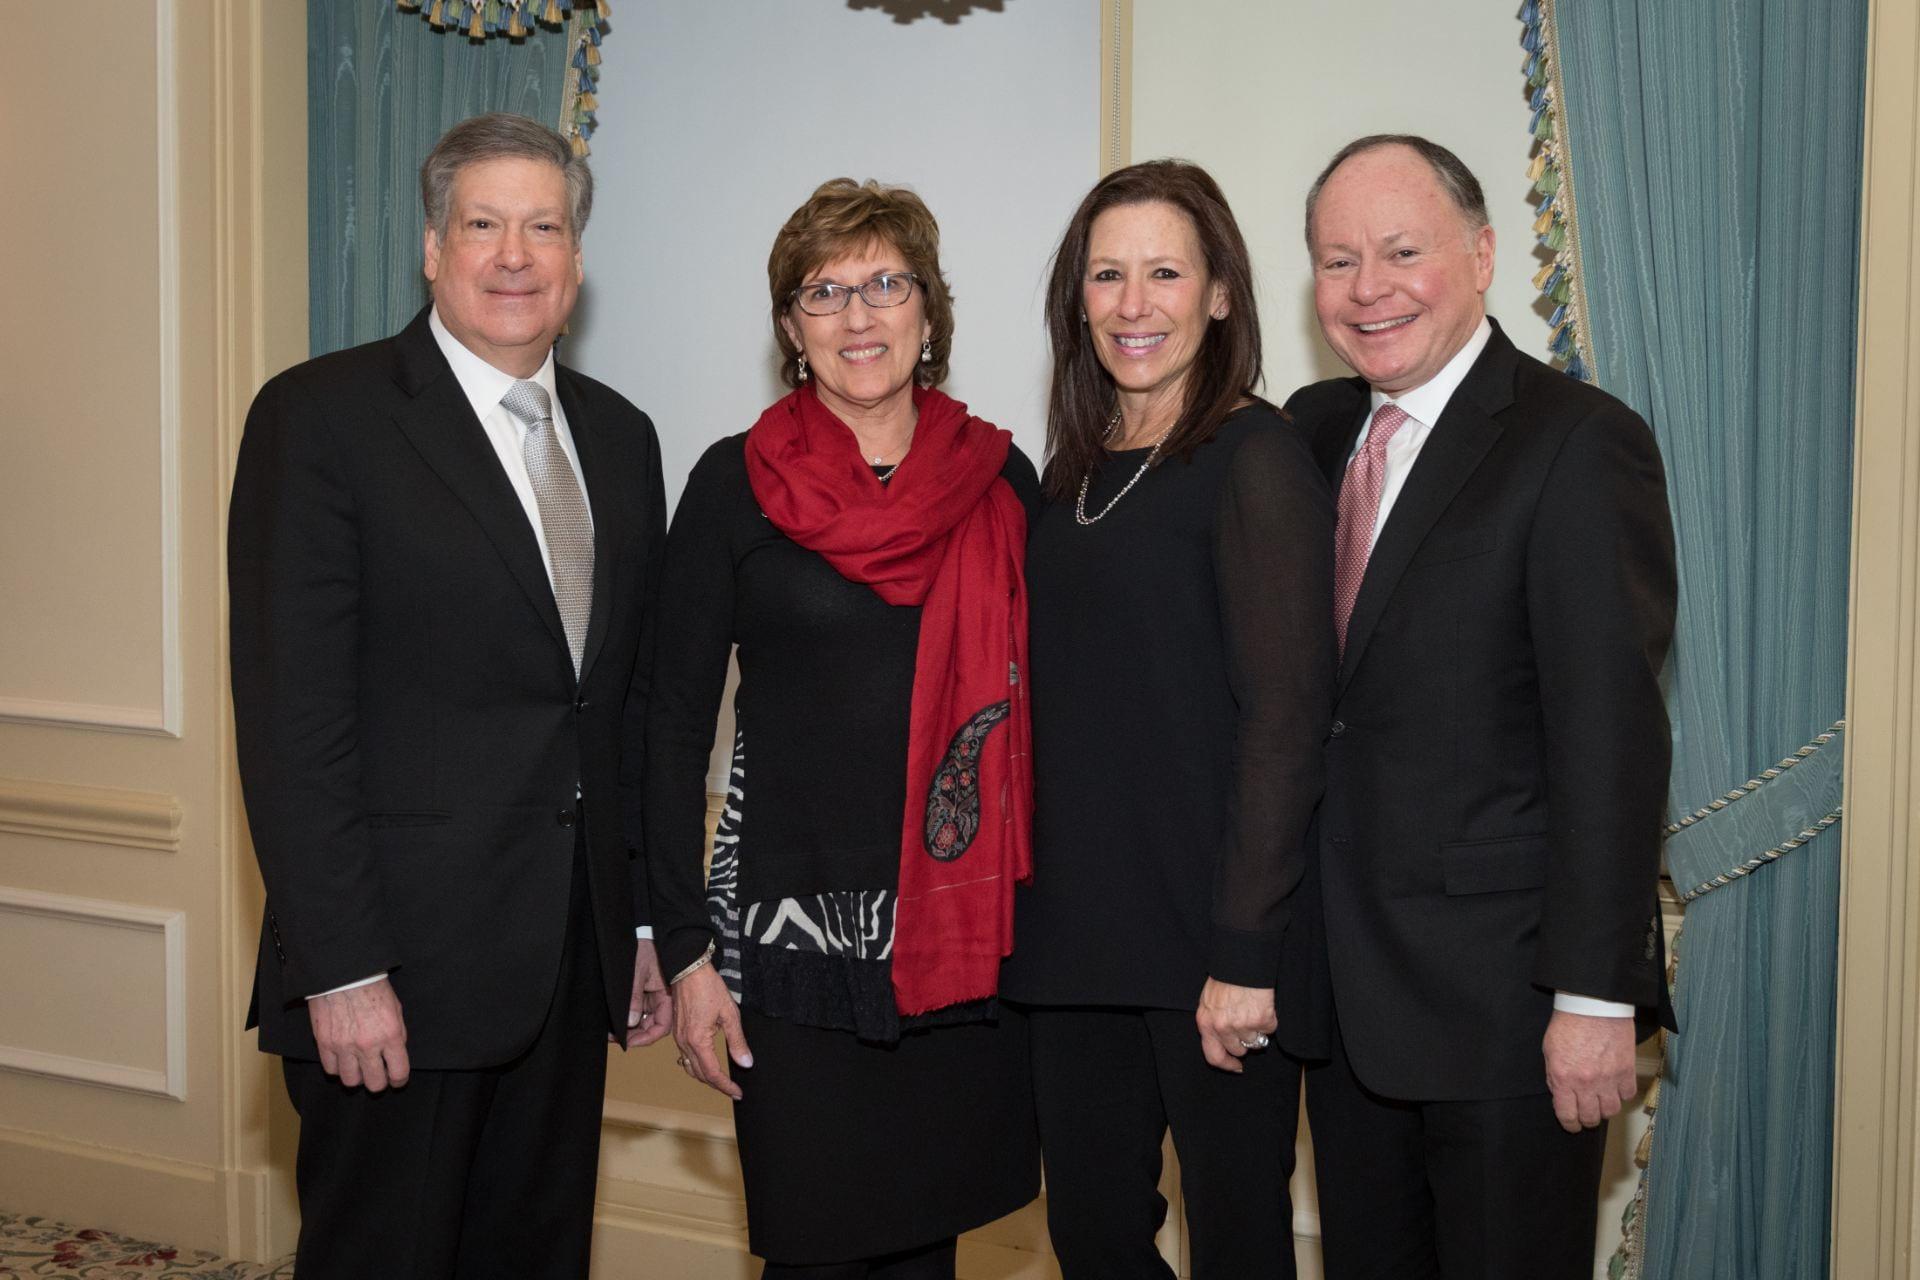 Bob Schreiber, Dale Schreiber, Jane Bursky and Andy Bursky